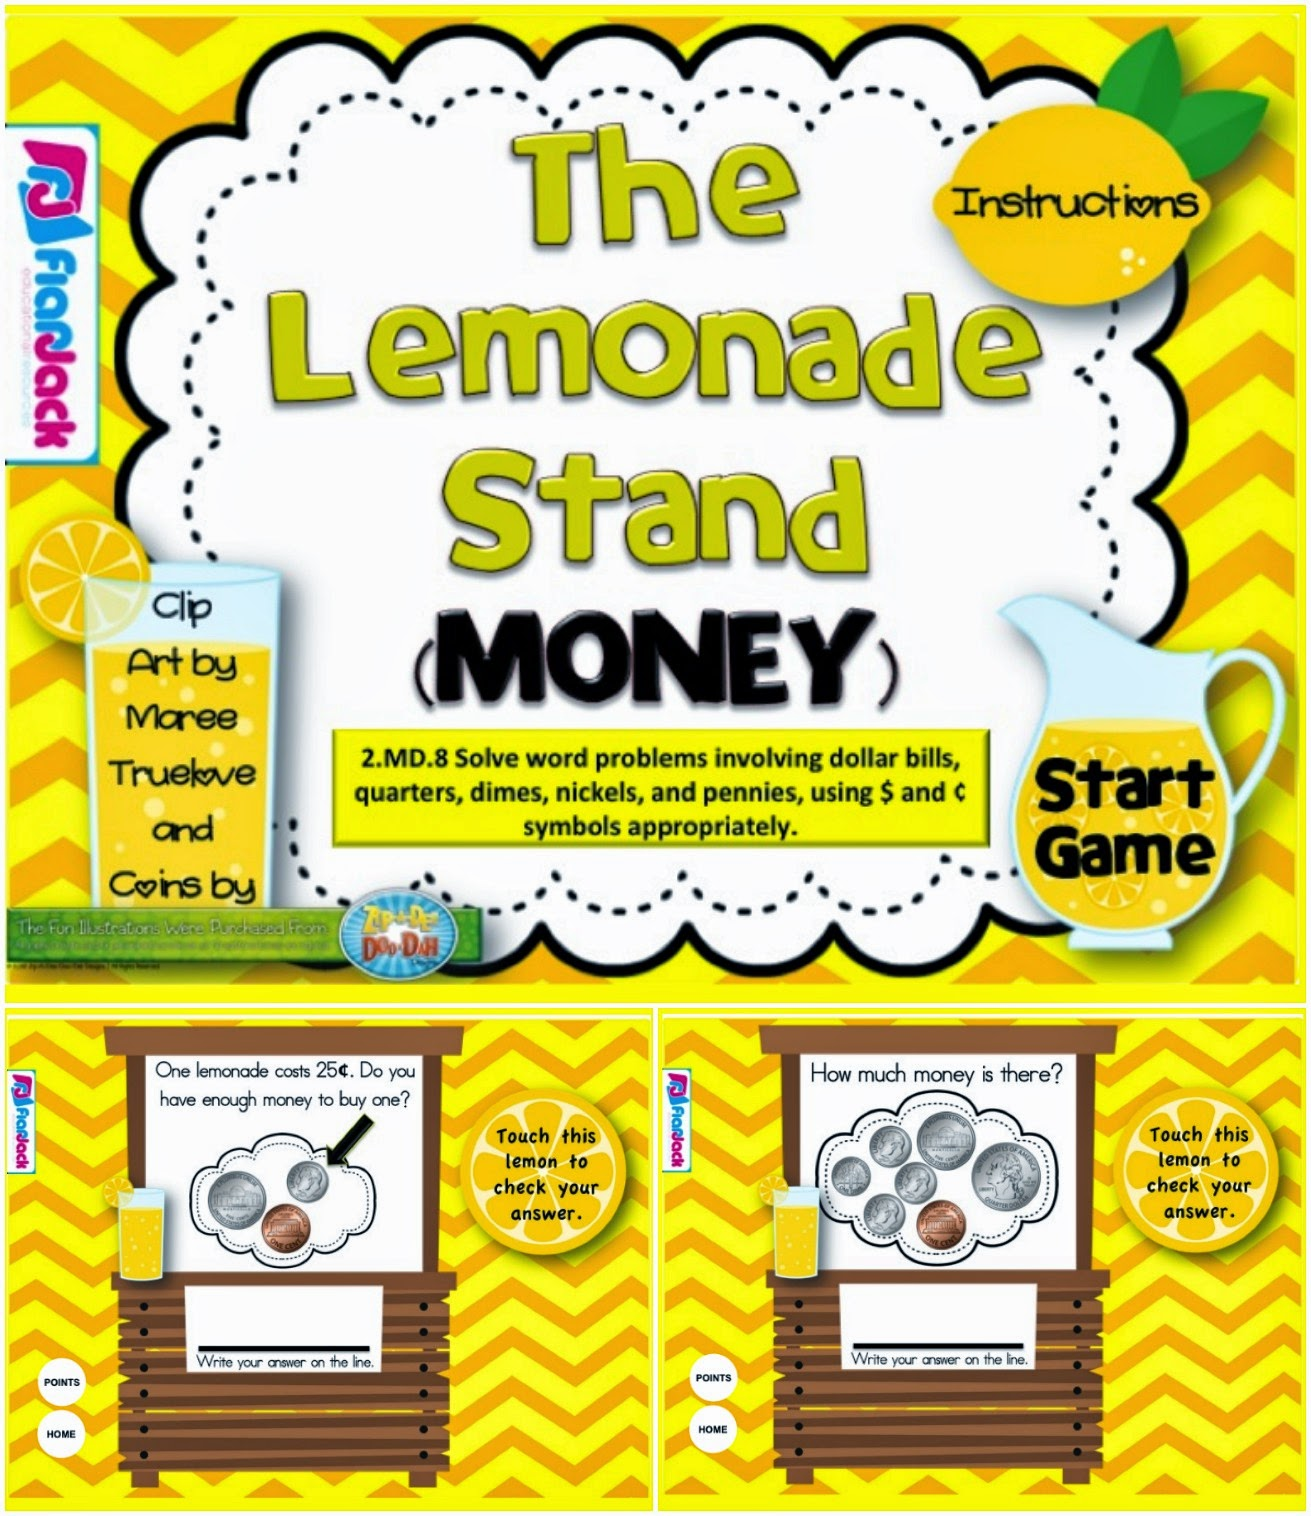 http://www.teacherspayteachers.com/Product/The-Lemonade-Stand-Money-Smart-Board-Game-CCSS2MD8-1232929